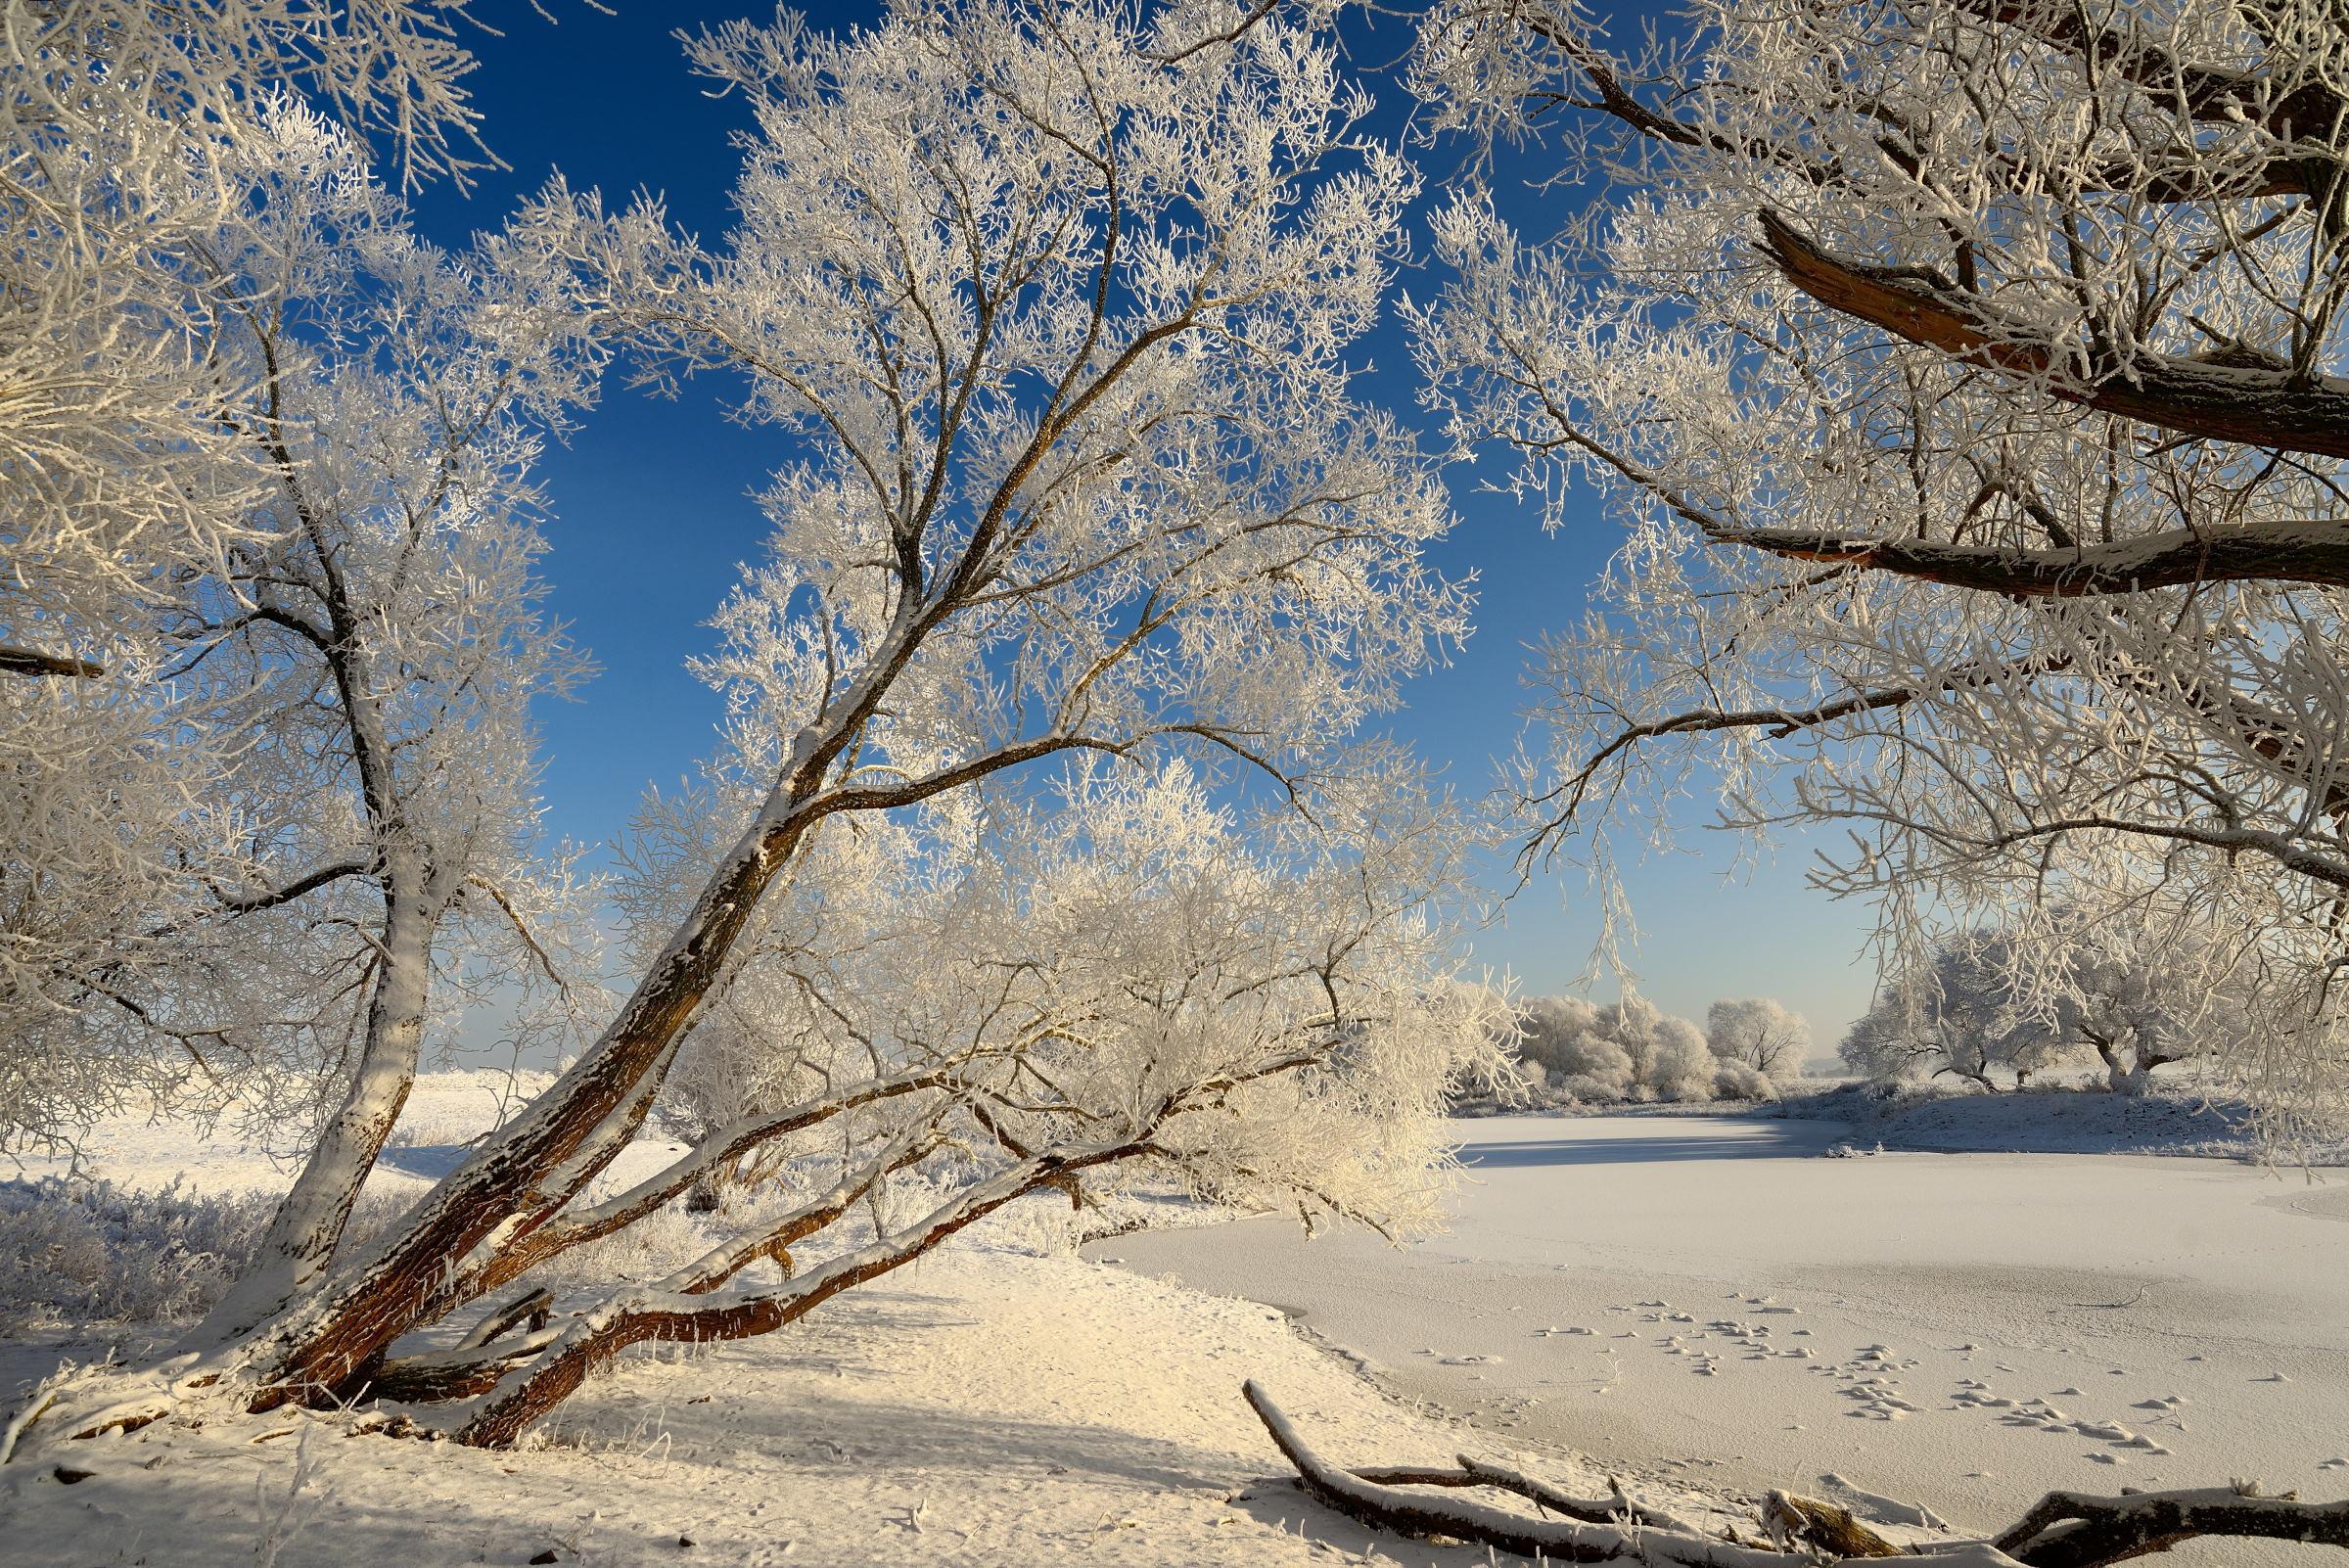 обои зима, снег, деревья, замёрзшее озеро картинки фото